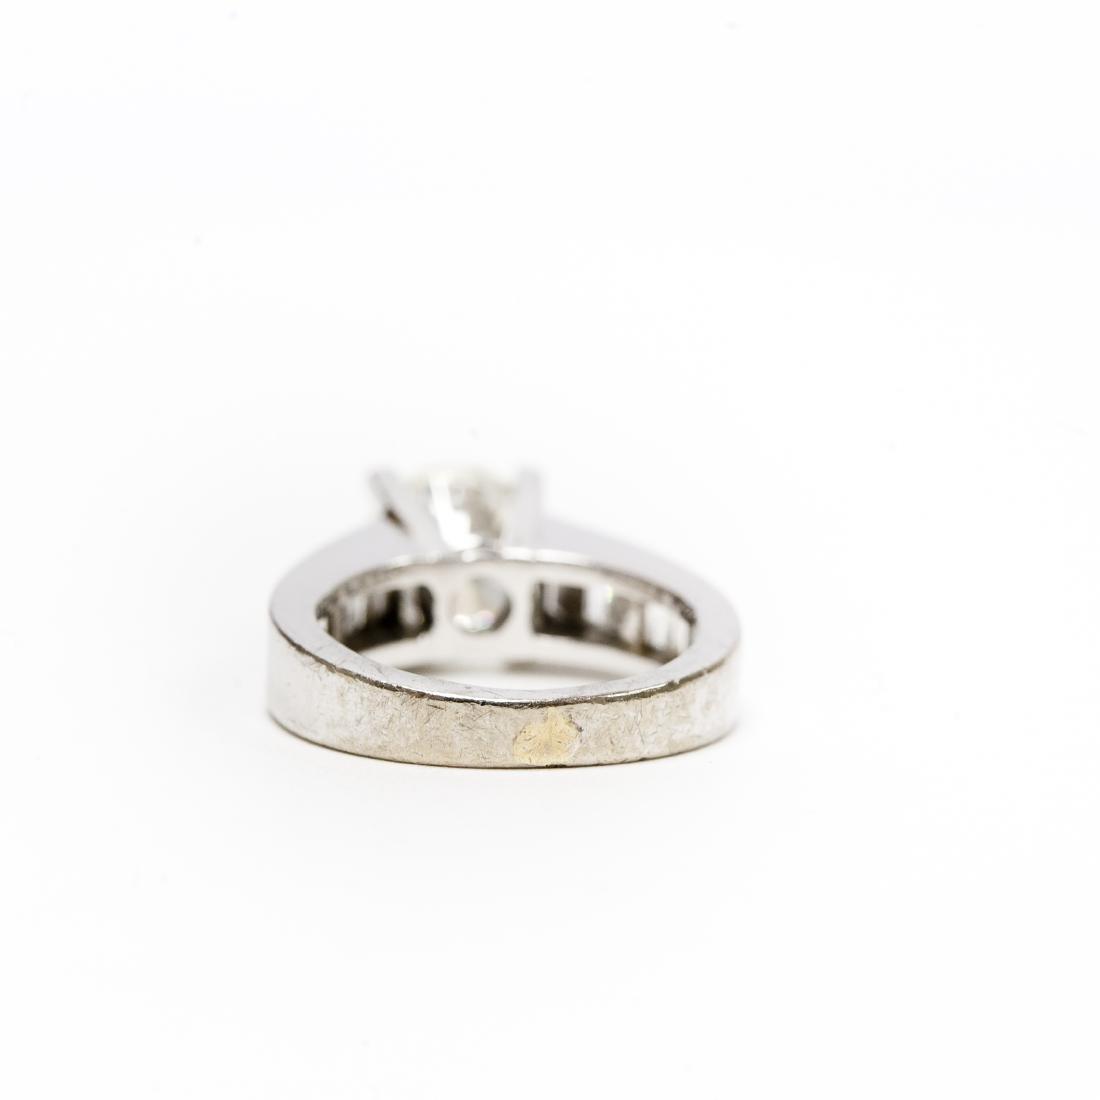 18K White Gold & Diamond Ring. 2.17 ct Center Diamond. - 5